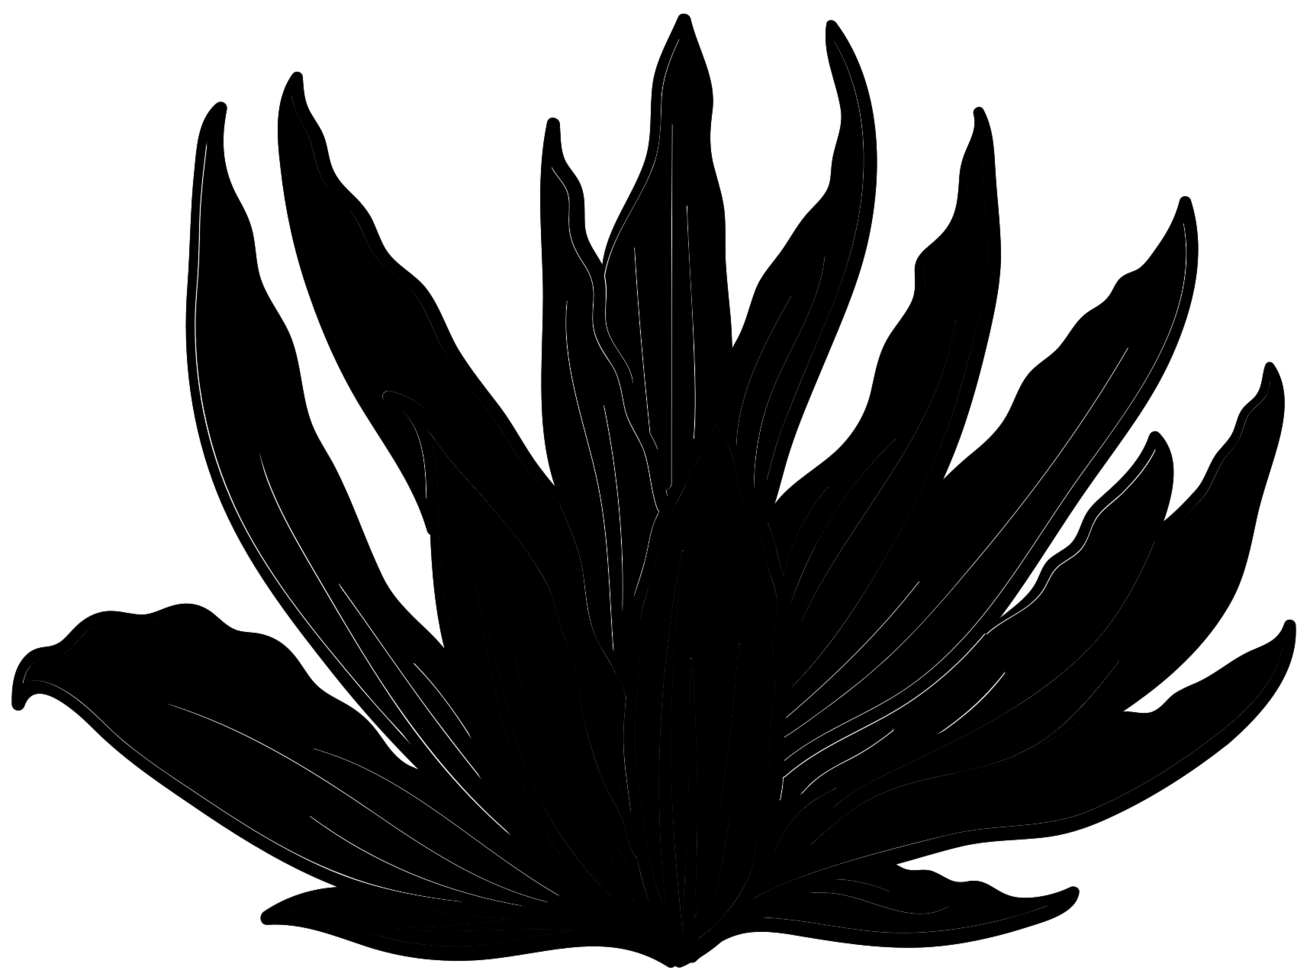 Aloe Pflanze png